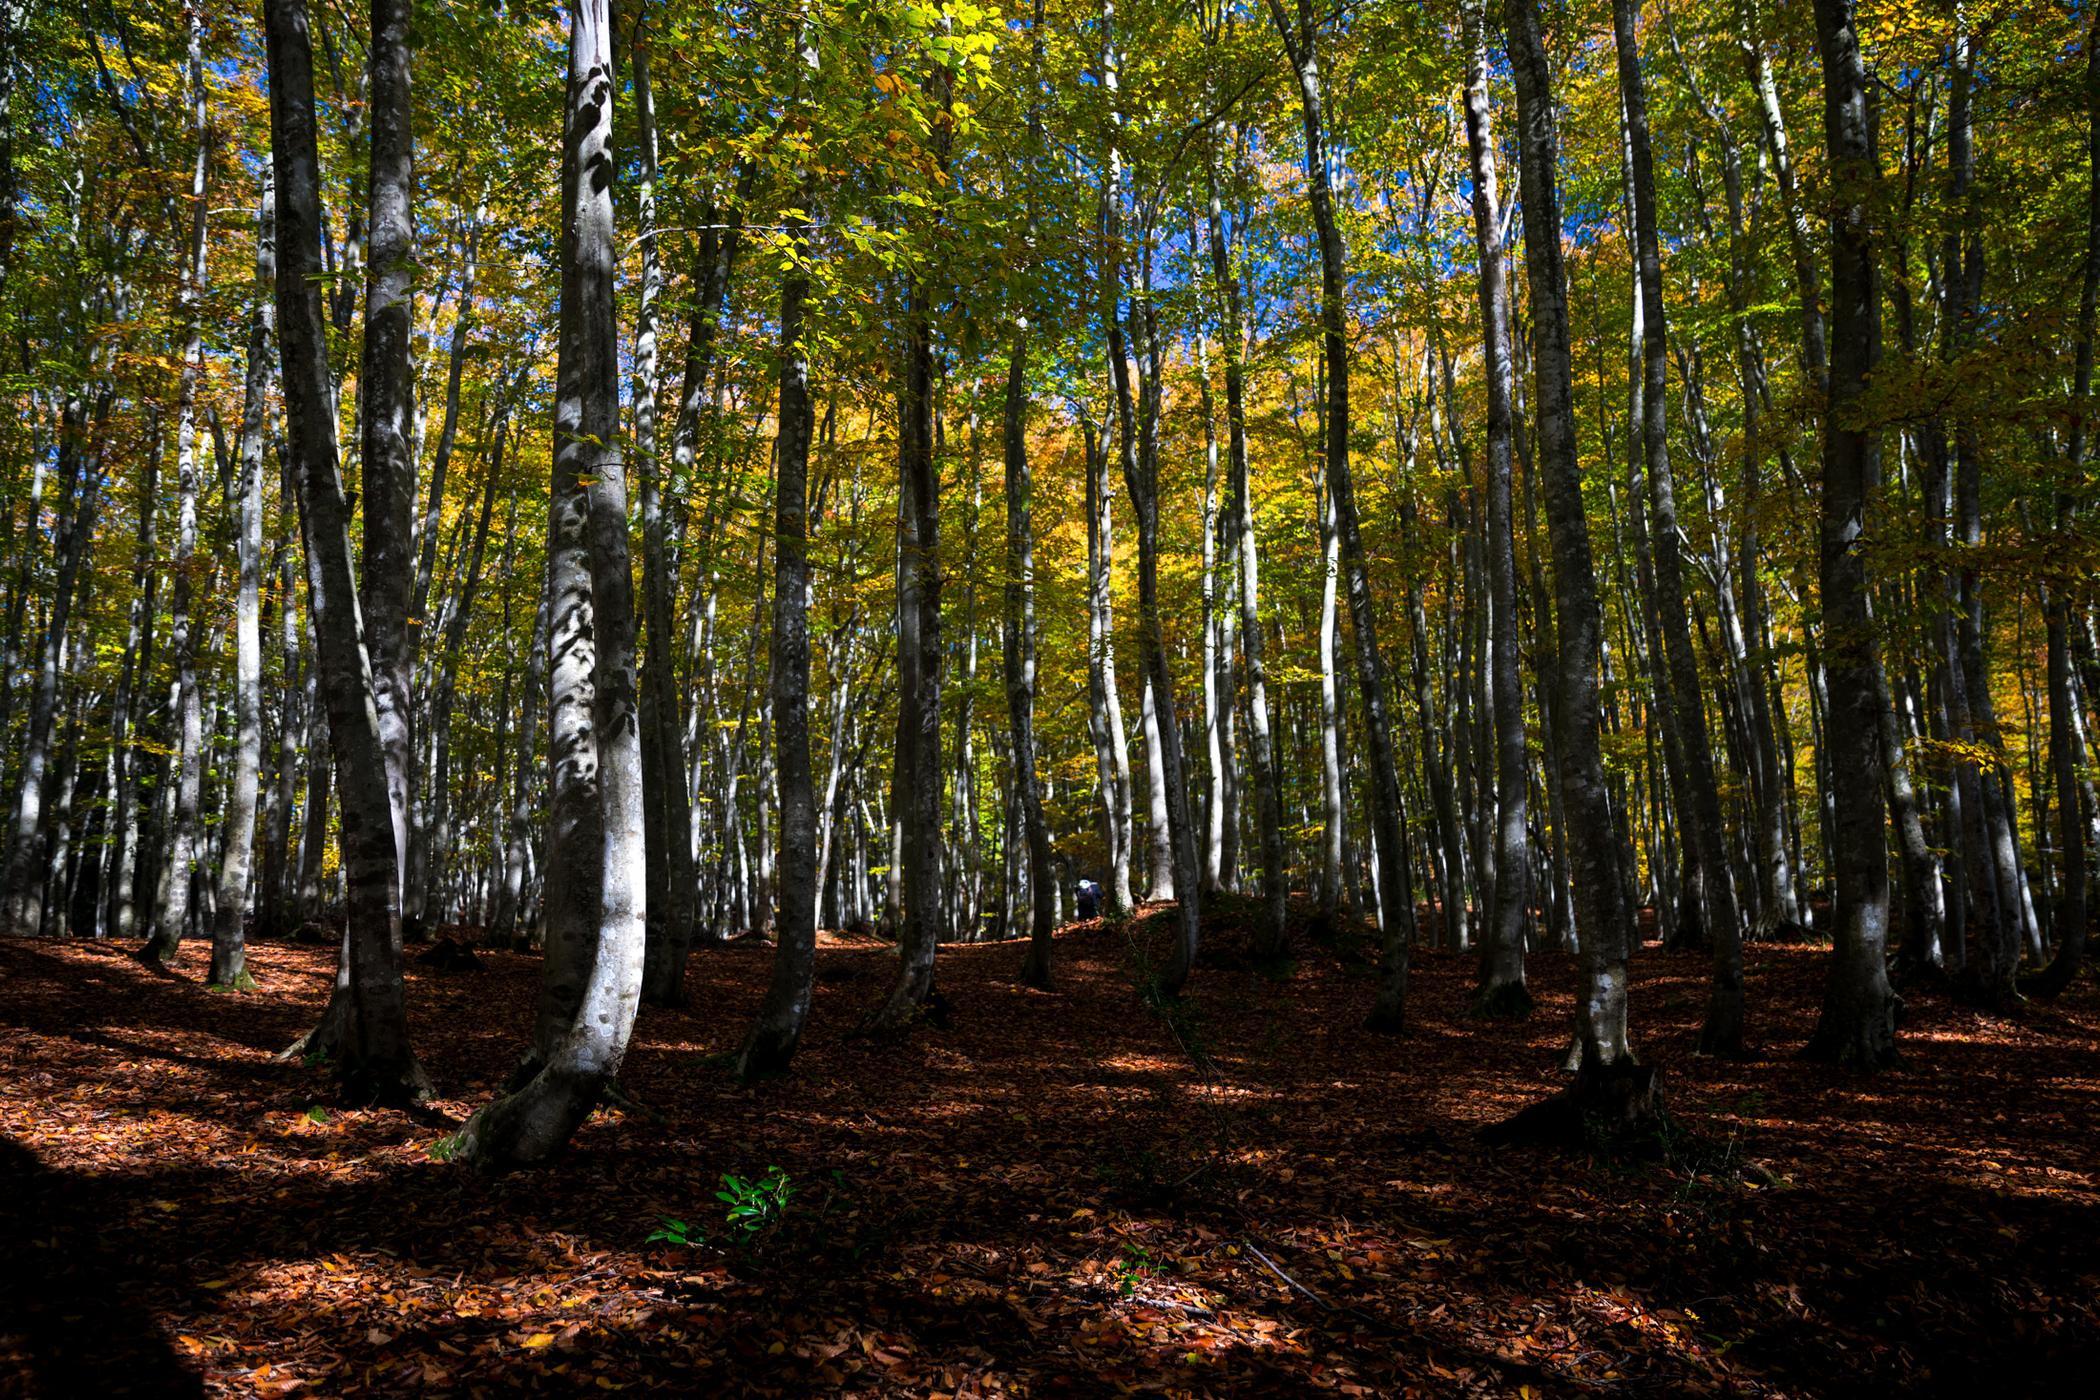 autumn, forest, natural, nature, tokamachi